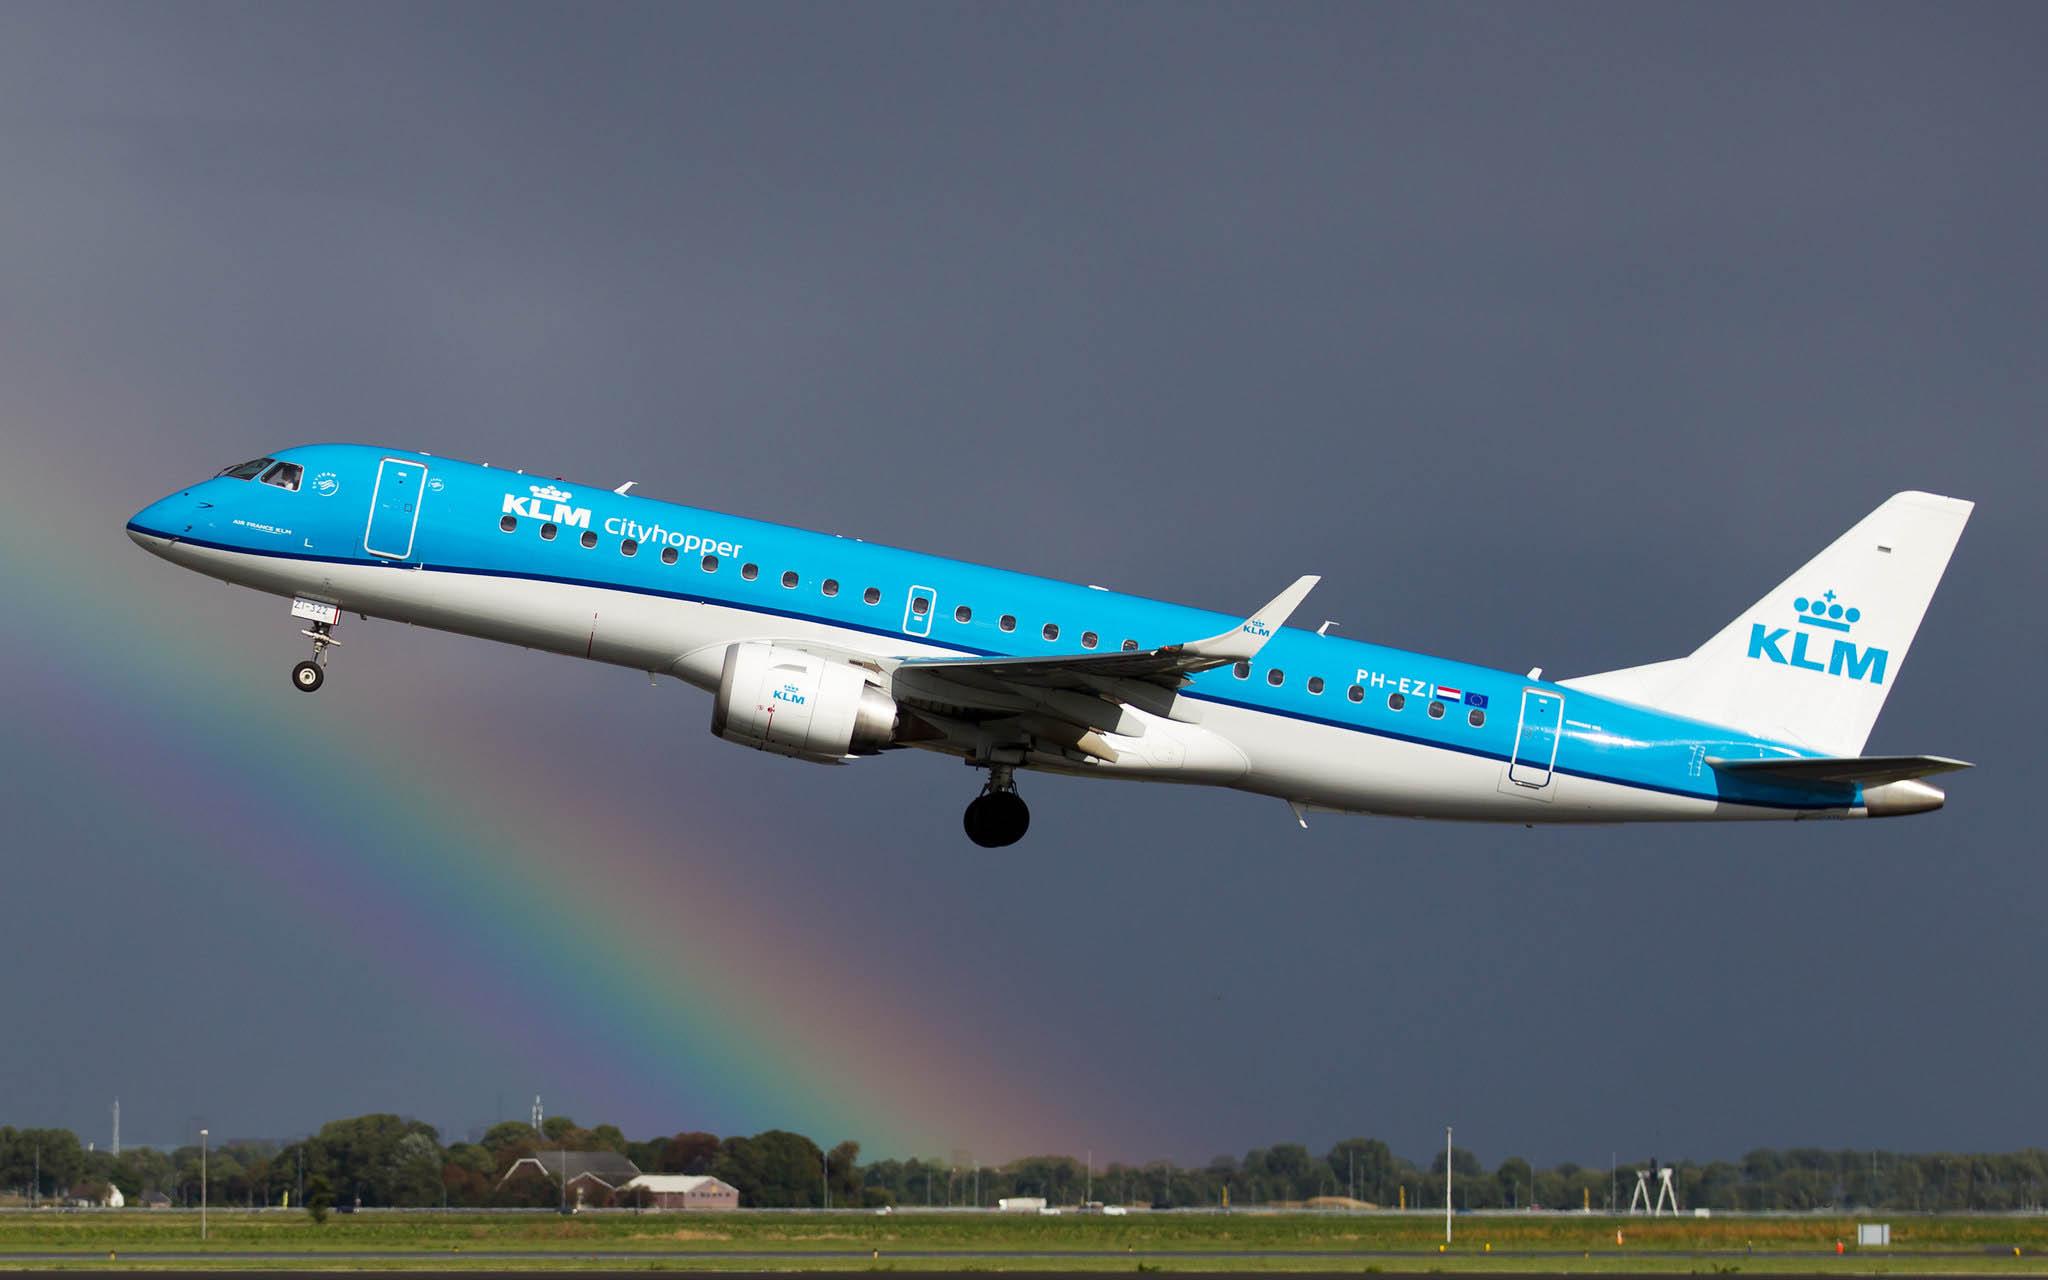 Embraer 190 KLM Cityhopper